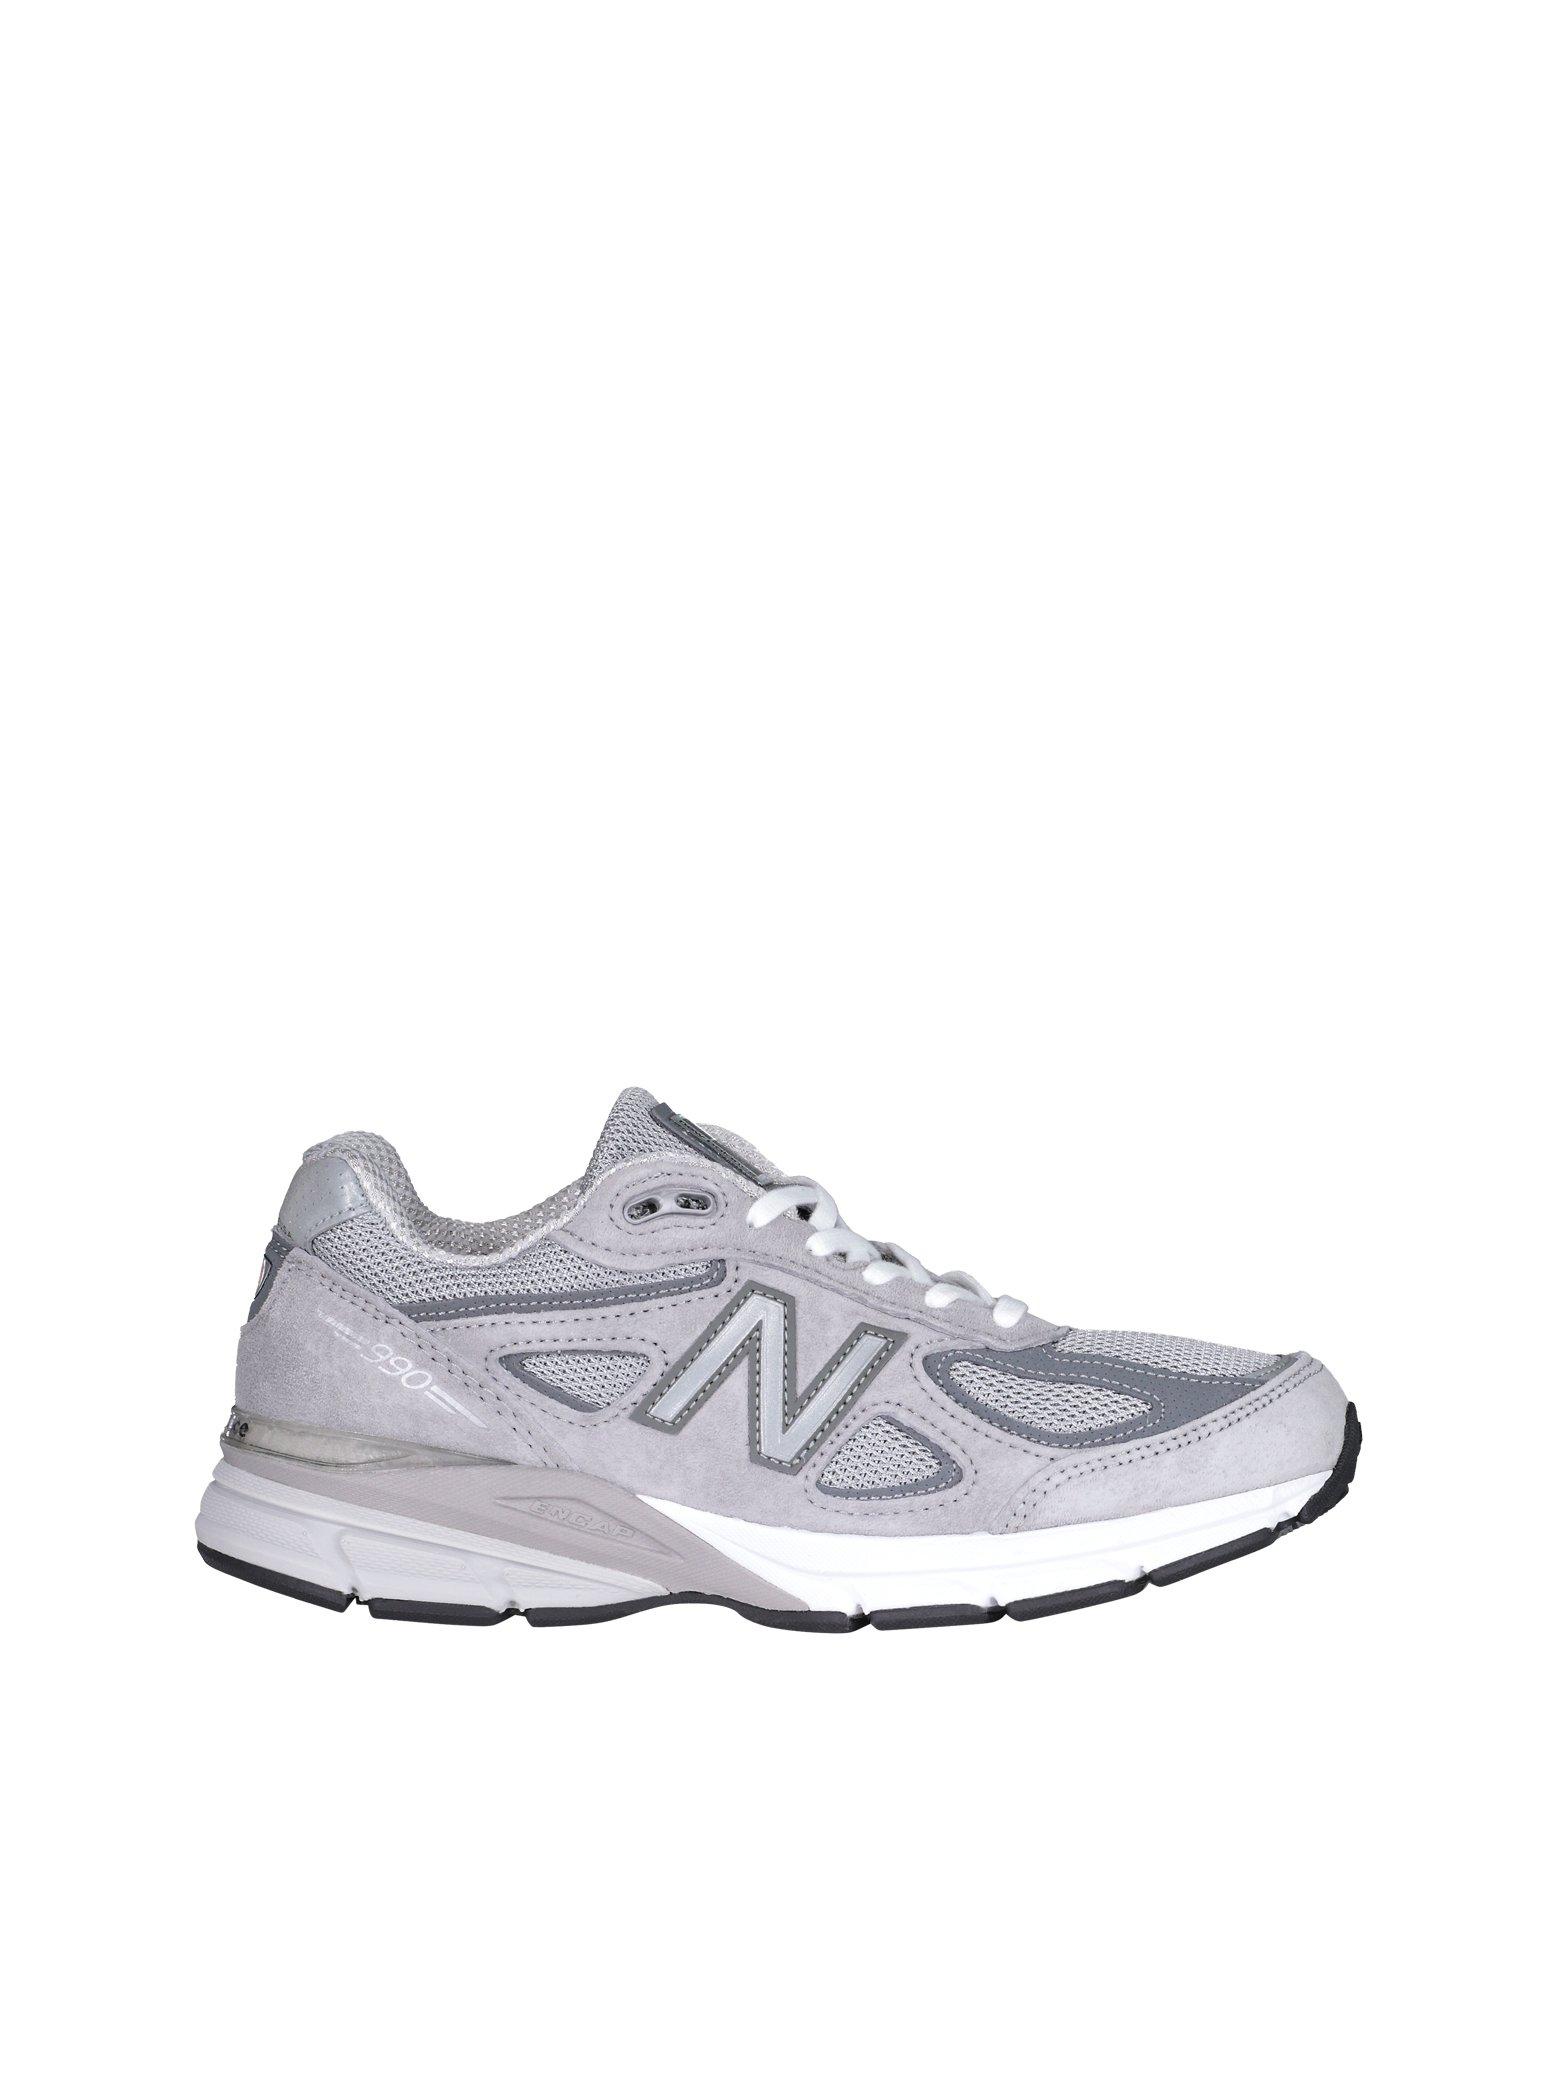 new product 465e6 91000 New Balance W990GL4 Sneakers - Grey/Castlerock